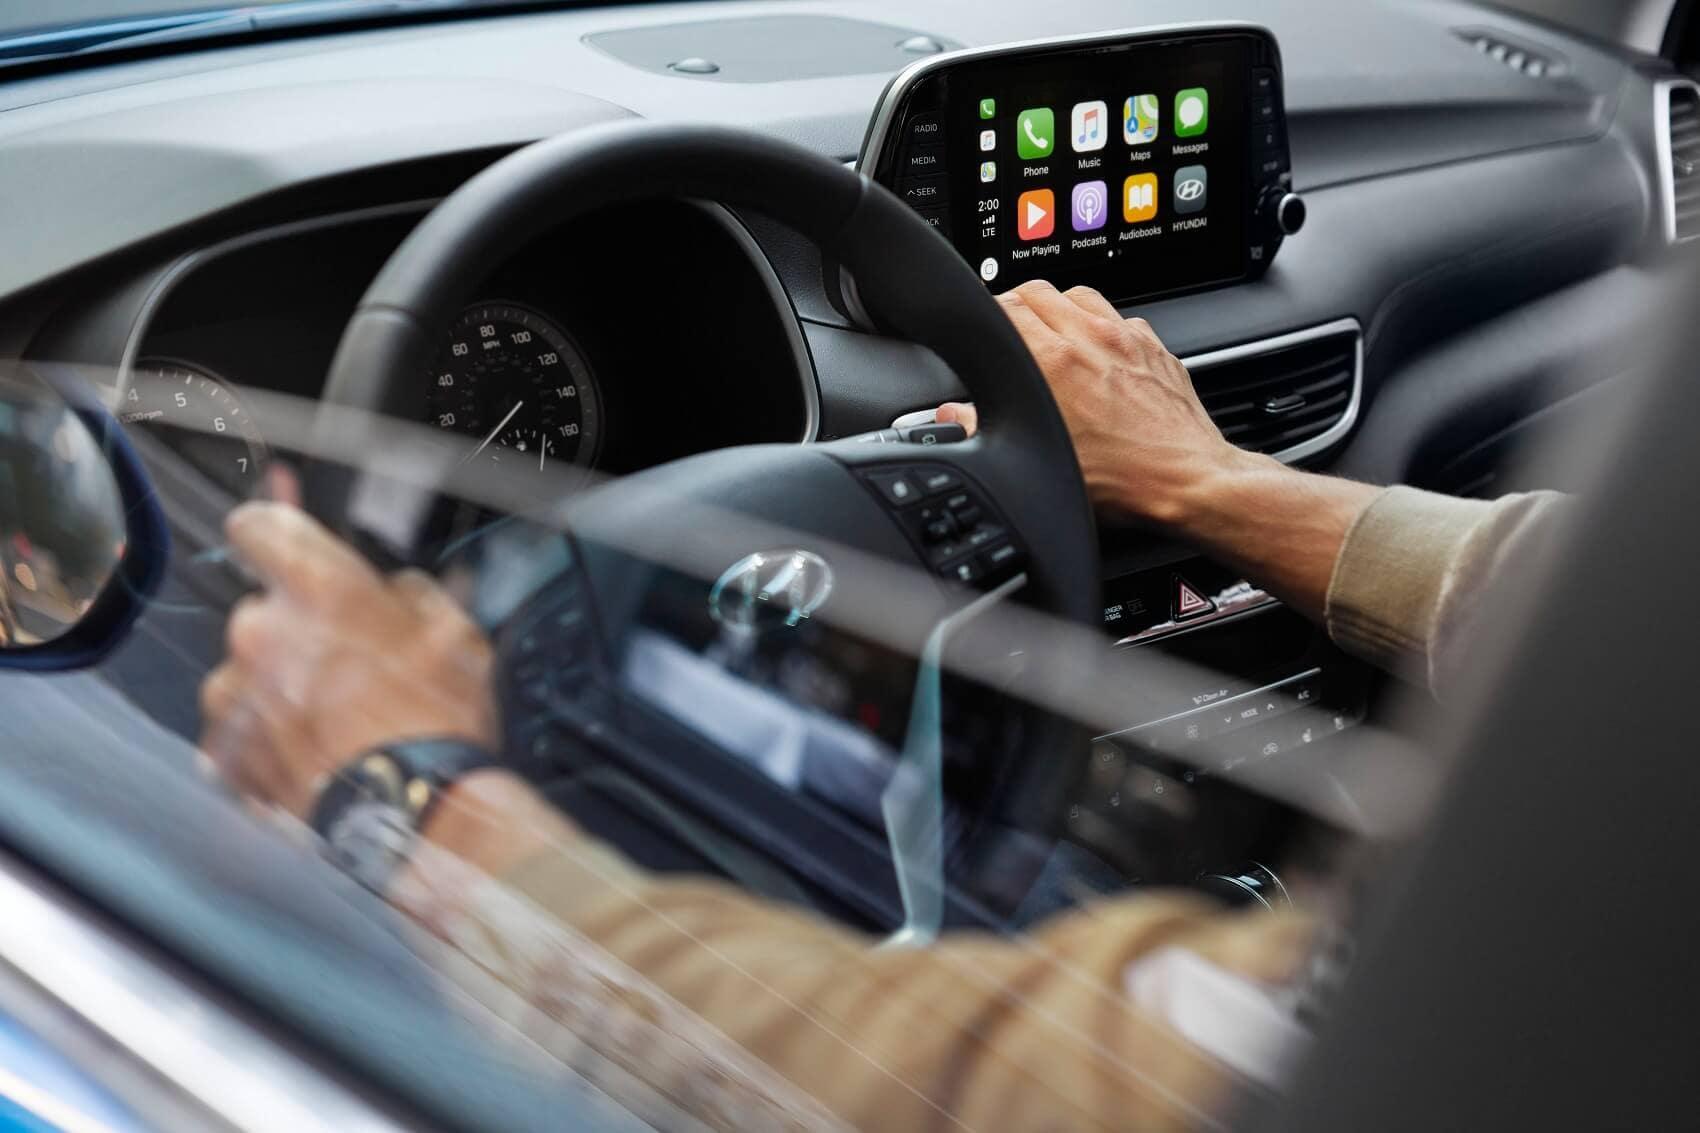 Hyundai Tuscon Interior with Apple CarPlay® Technology